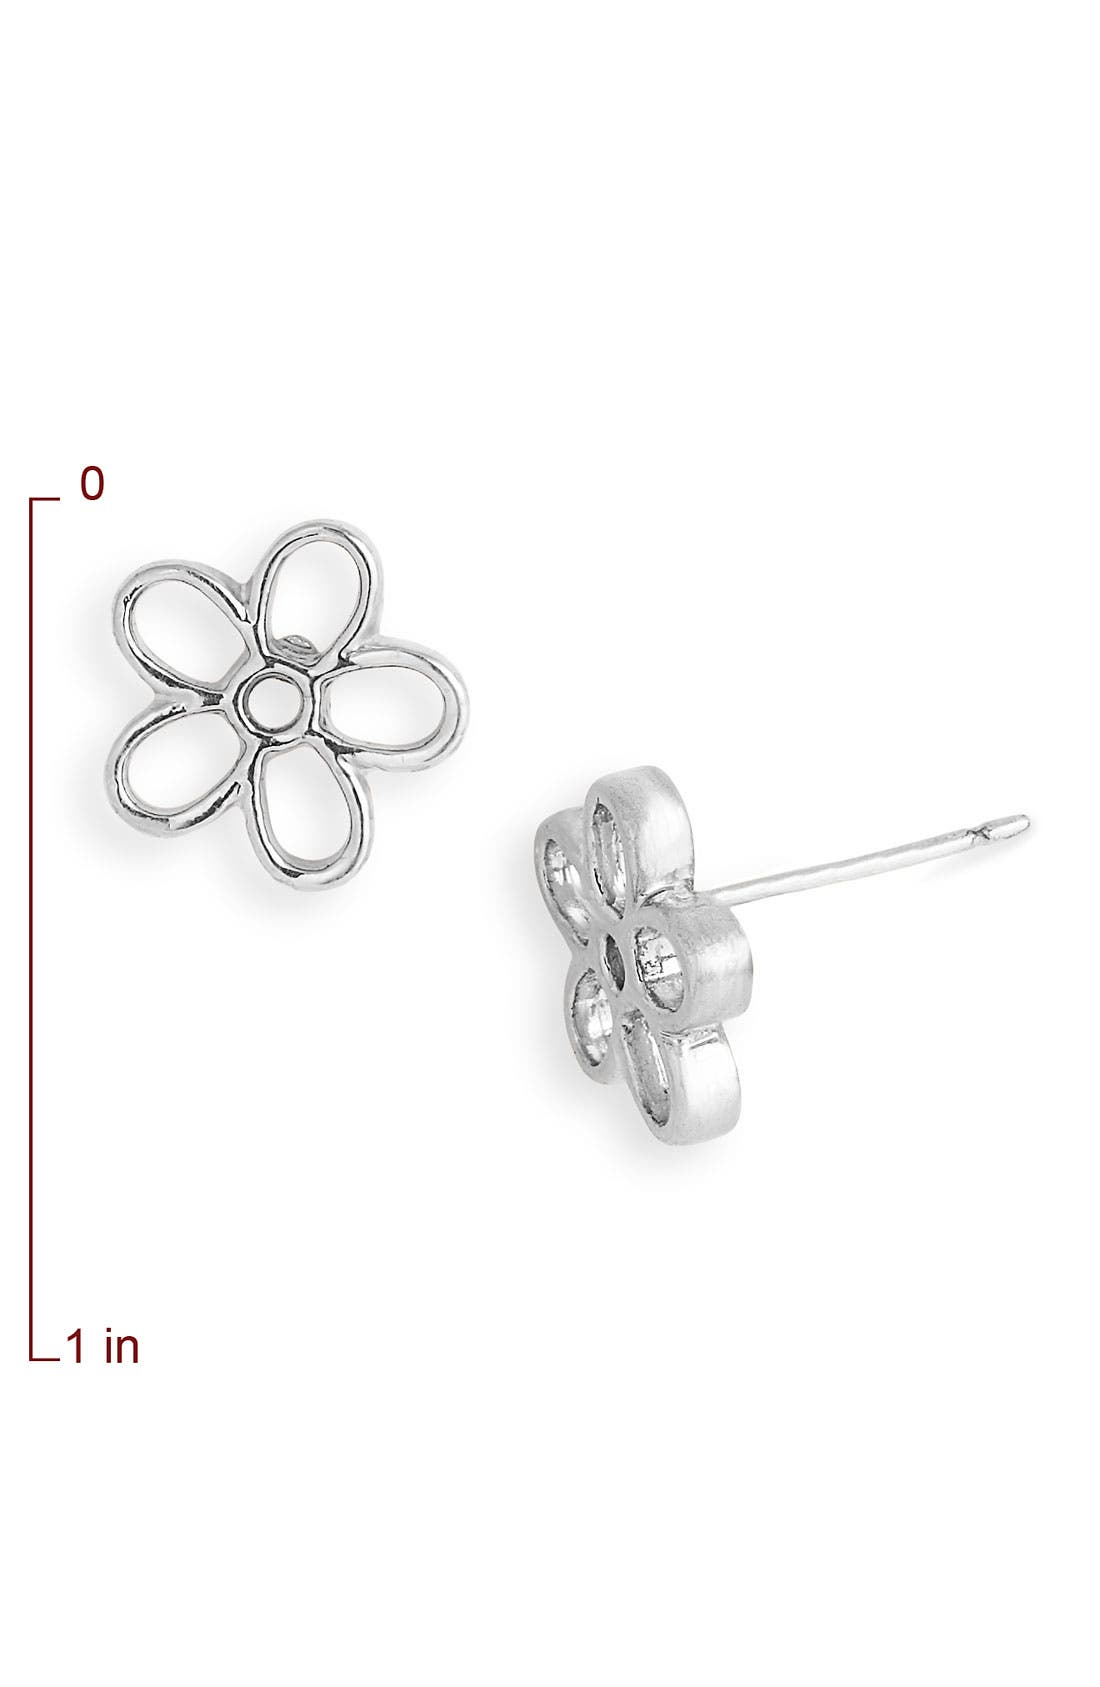 Daisy Stud Earrings,                             Alternate thumbnail 2, color,                             041